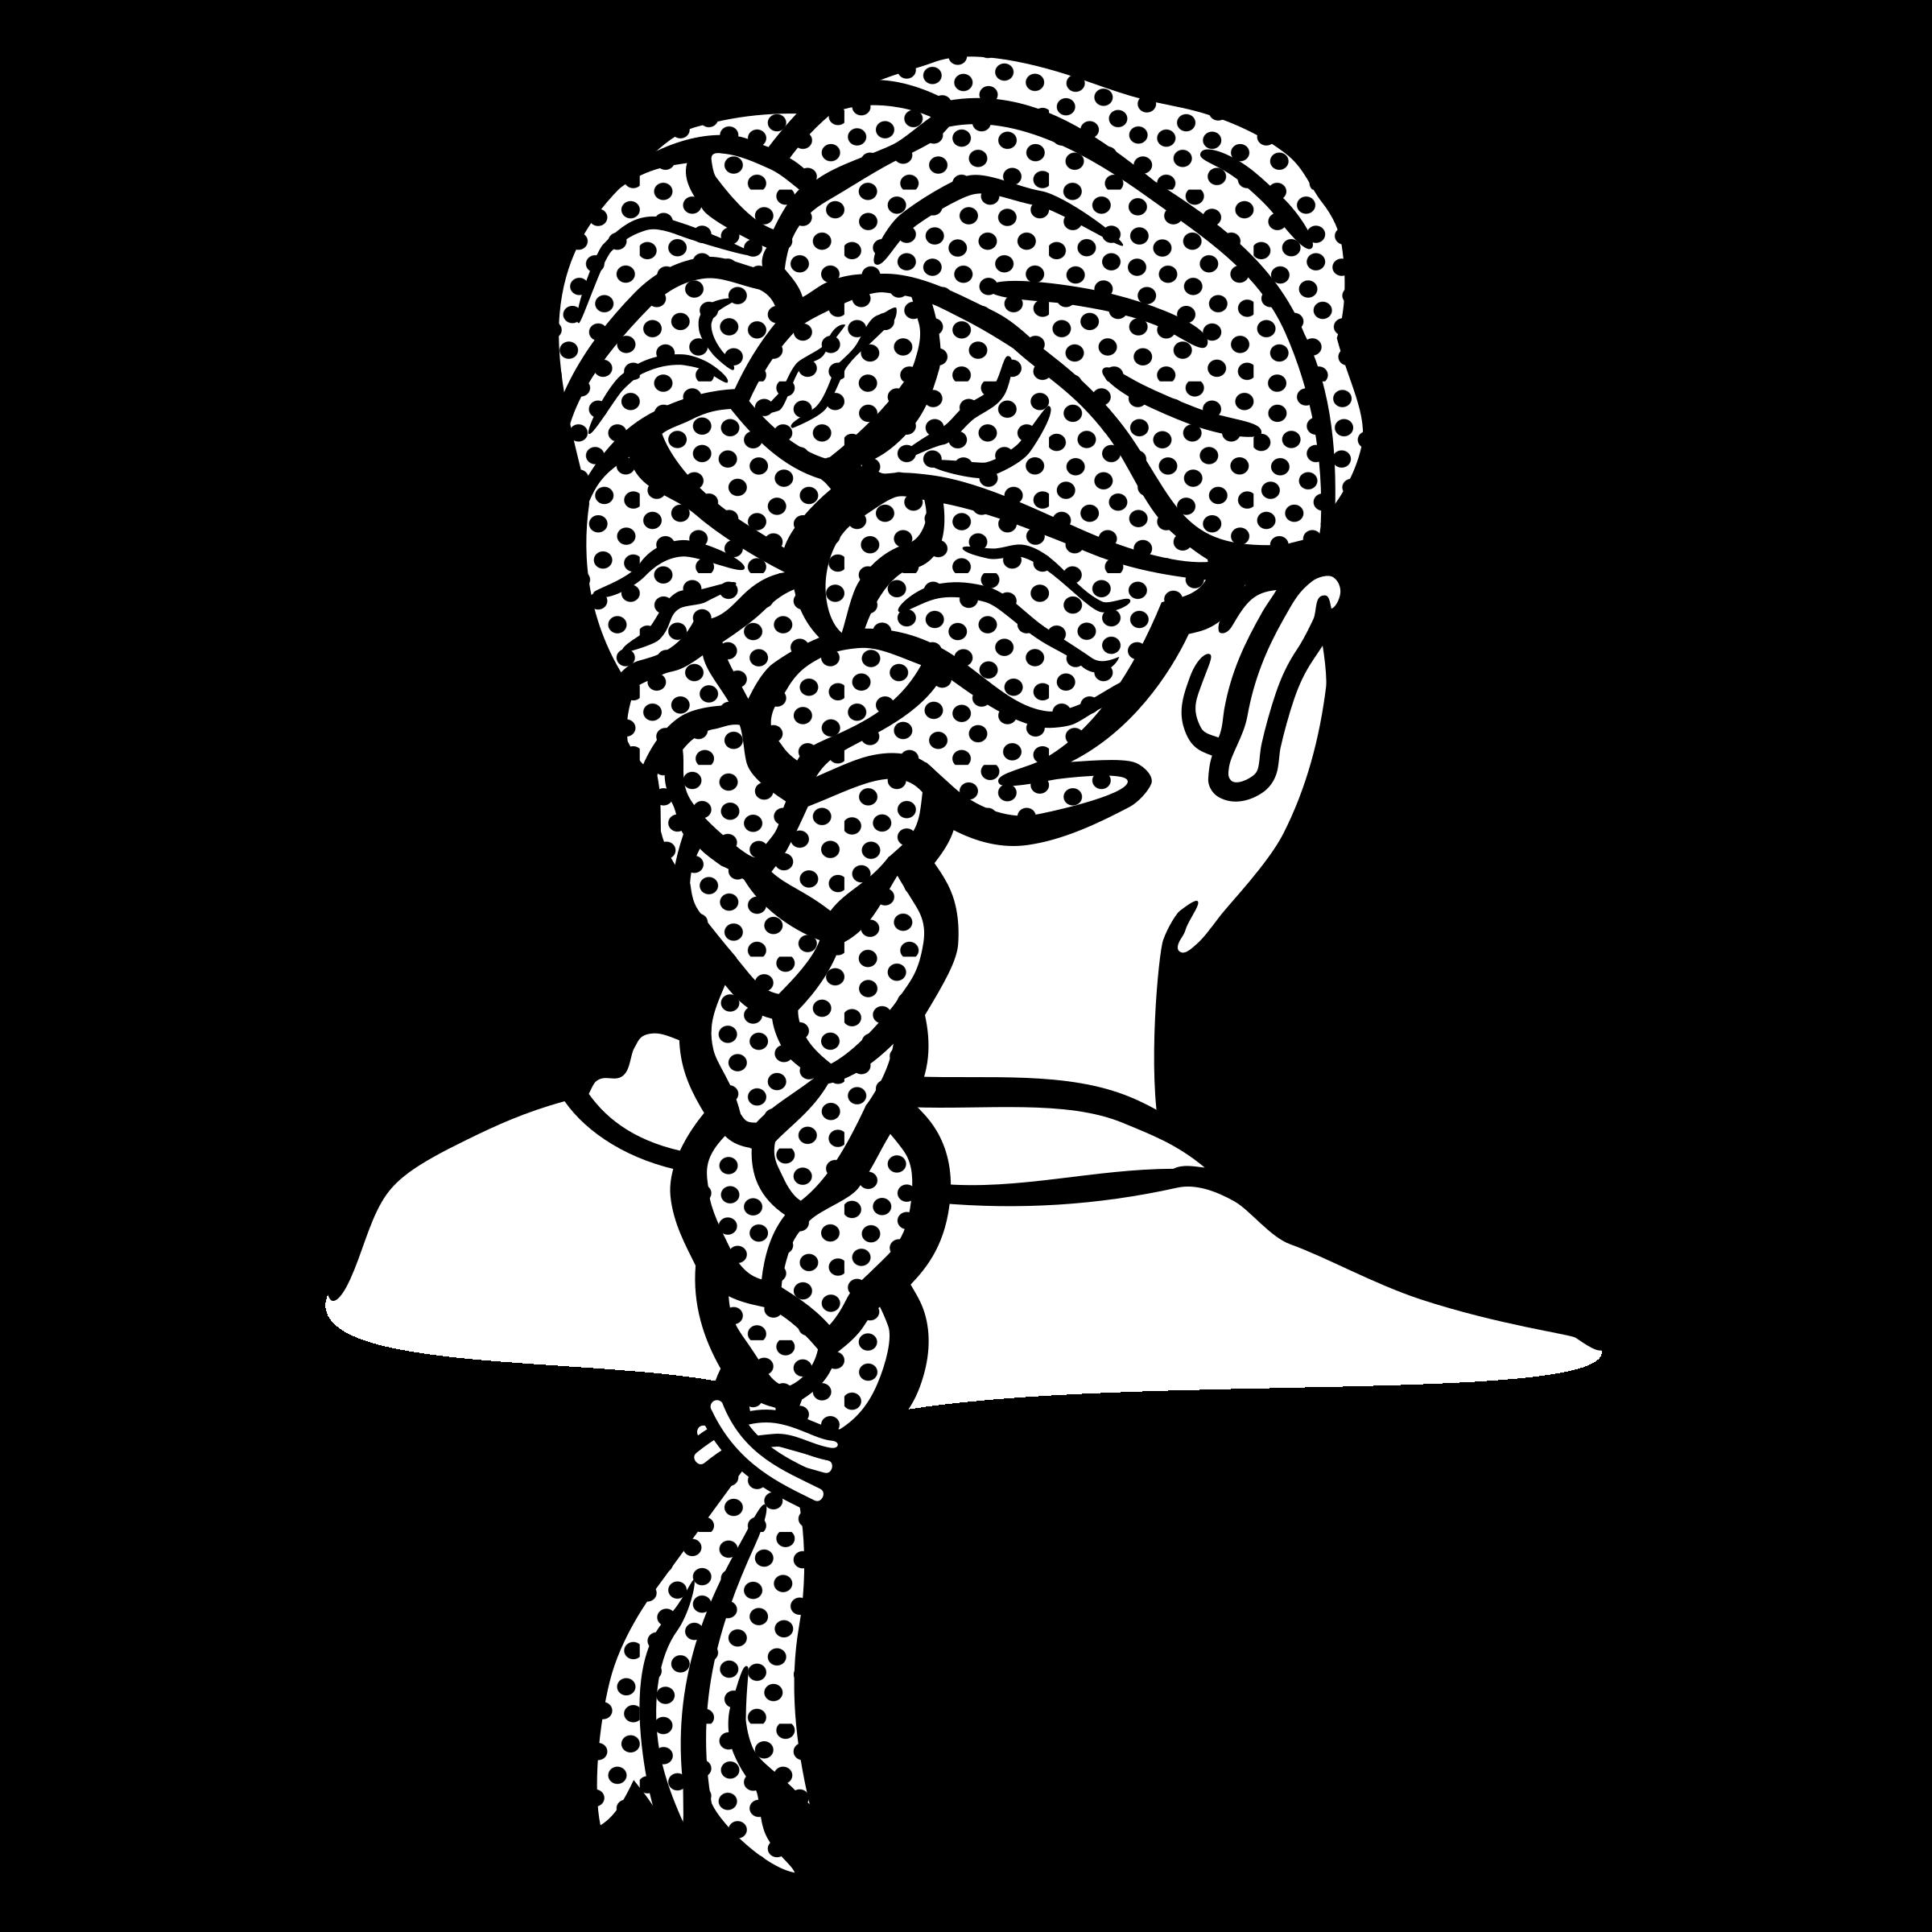 Braid clipart Lineart braid braid lineart Clipart